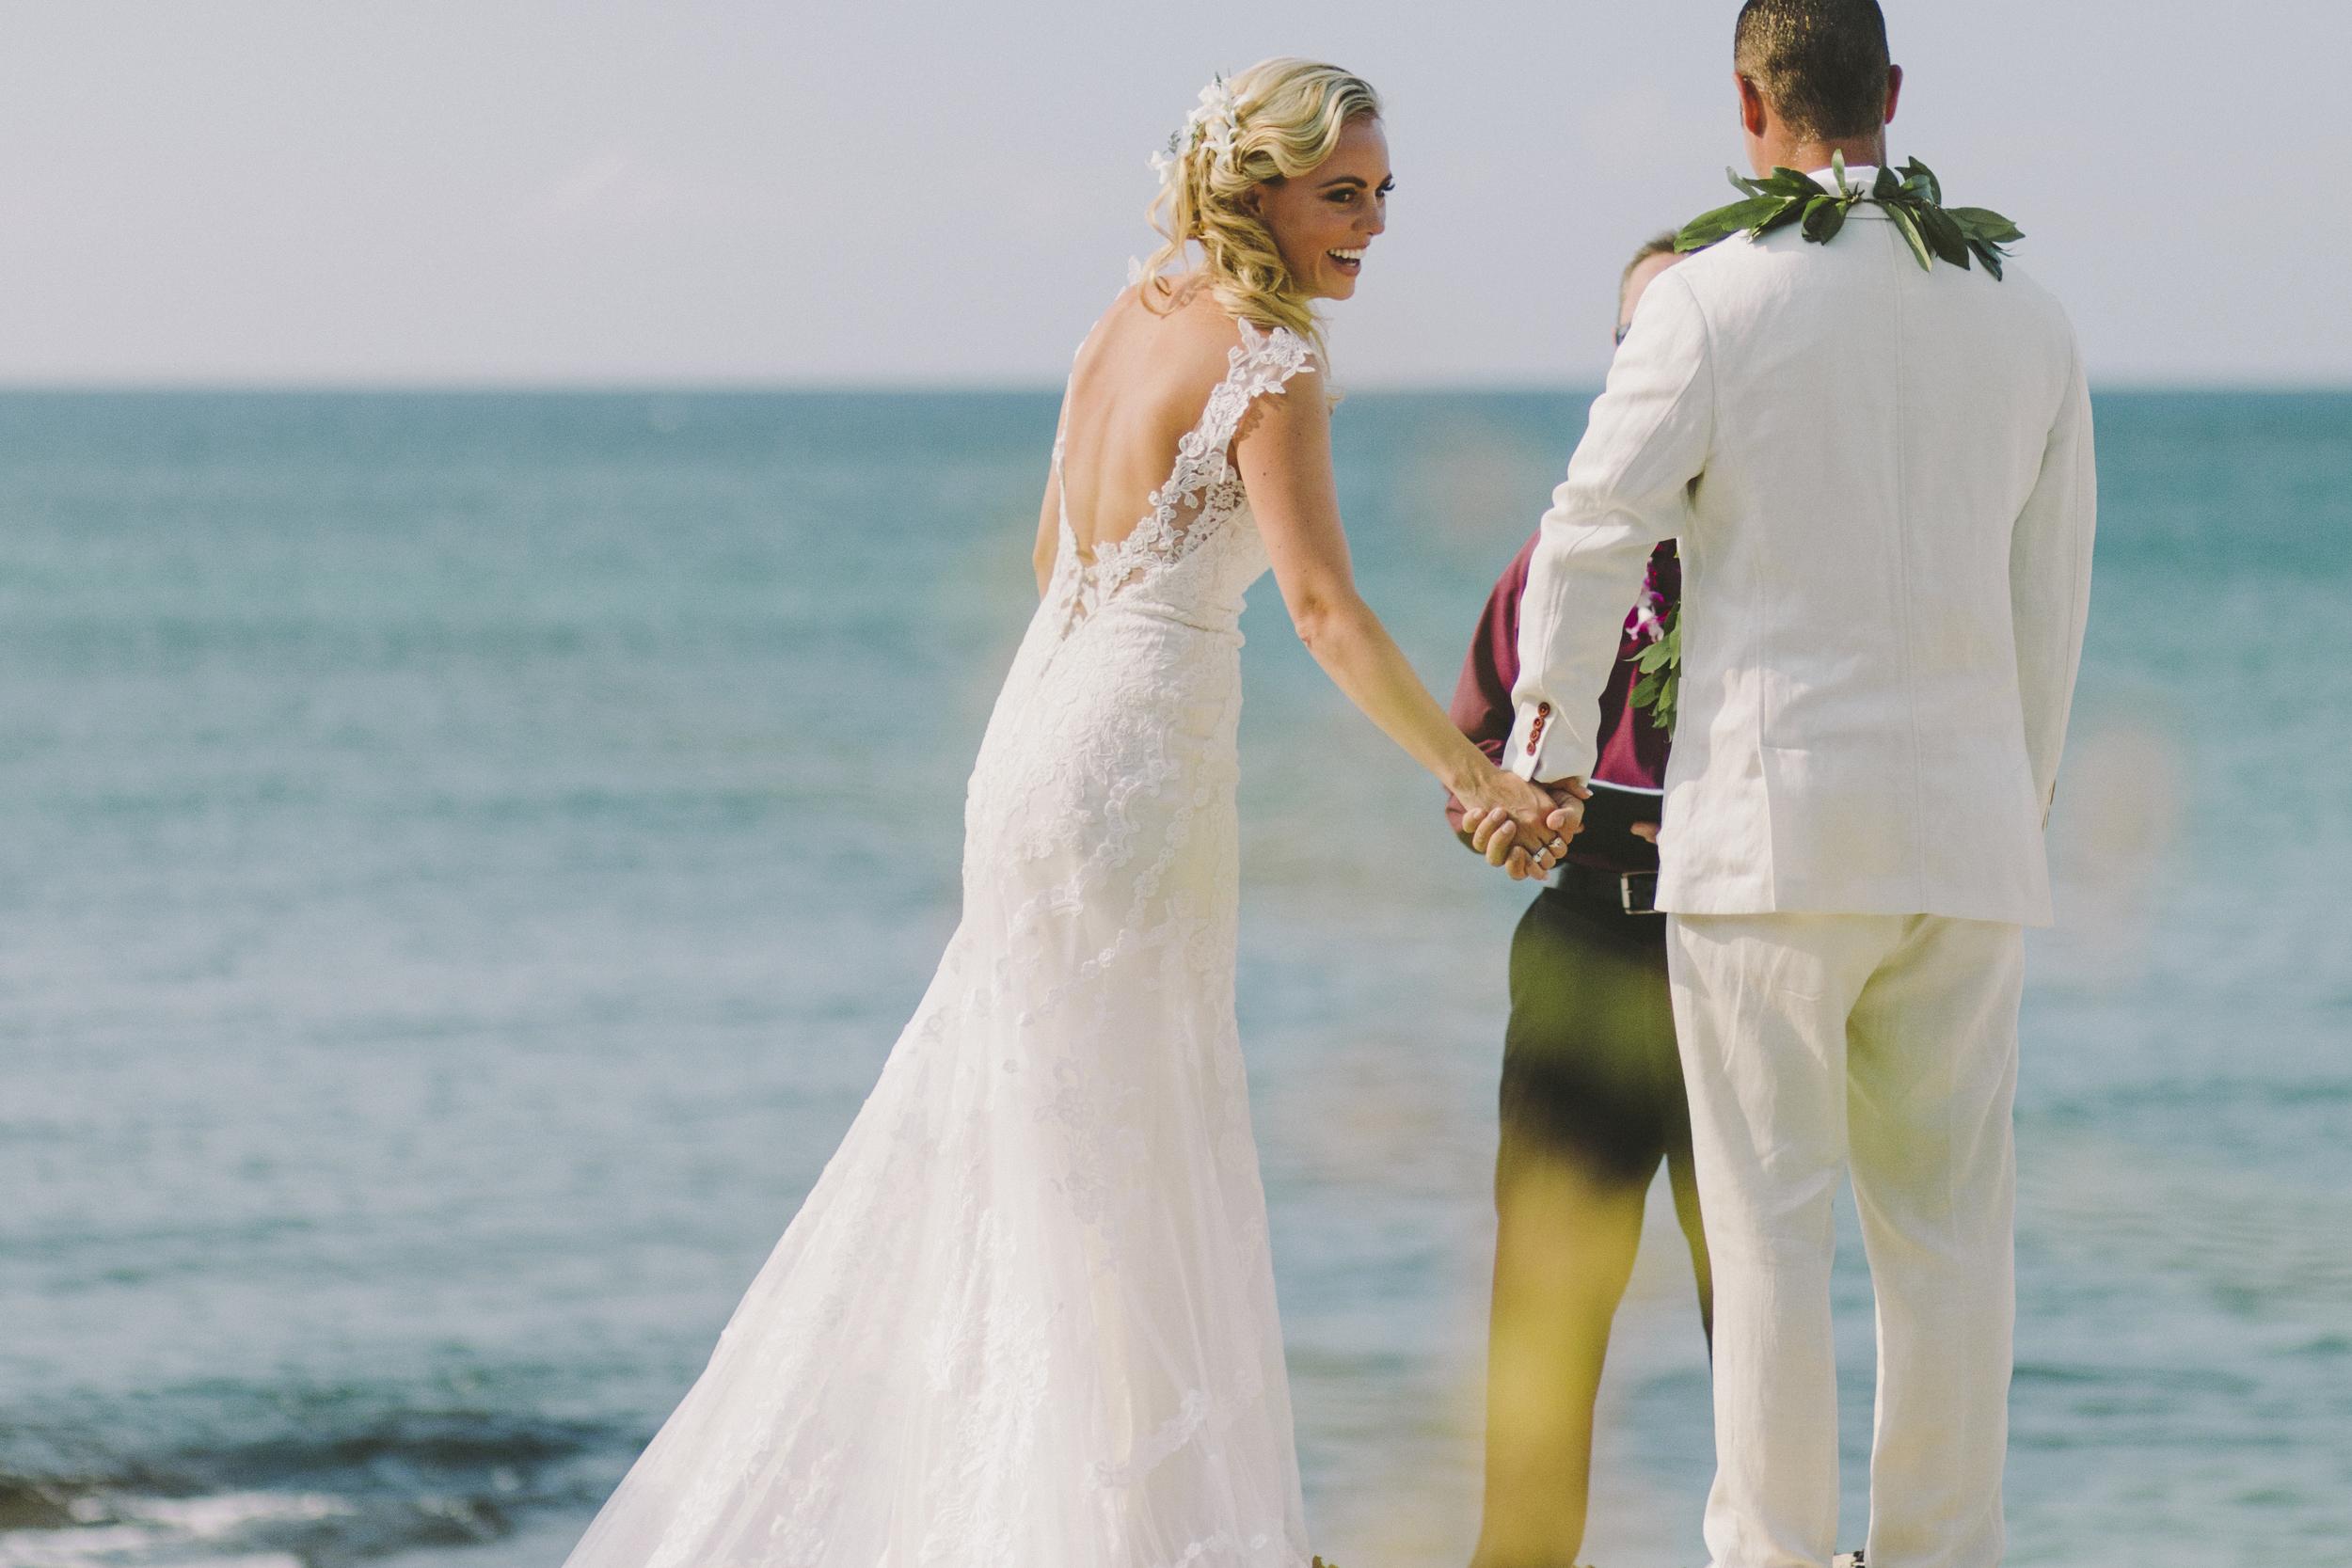 angie-diaz-photography-hawaii-wedding-photographer-kelli-jay-66.jpg